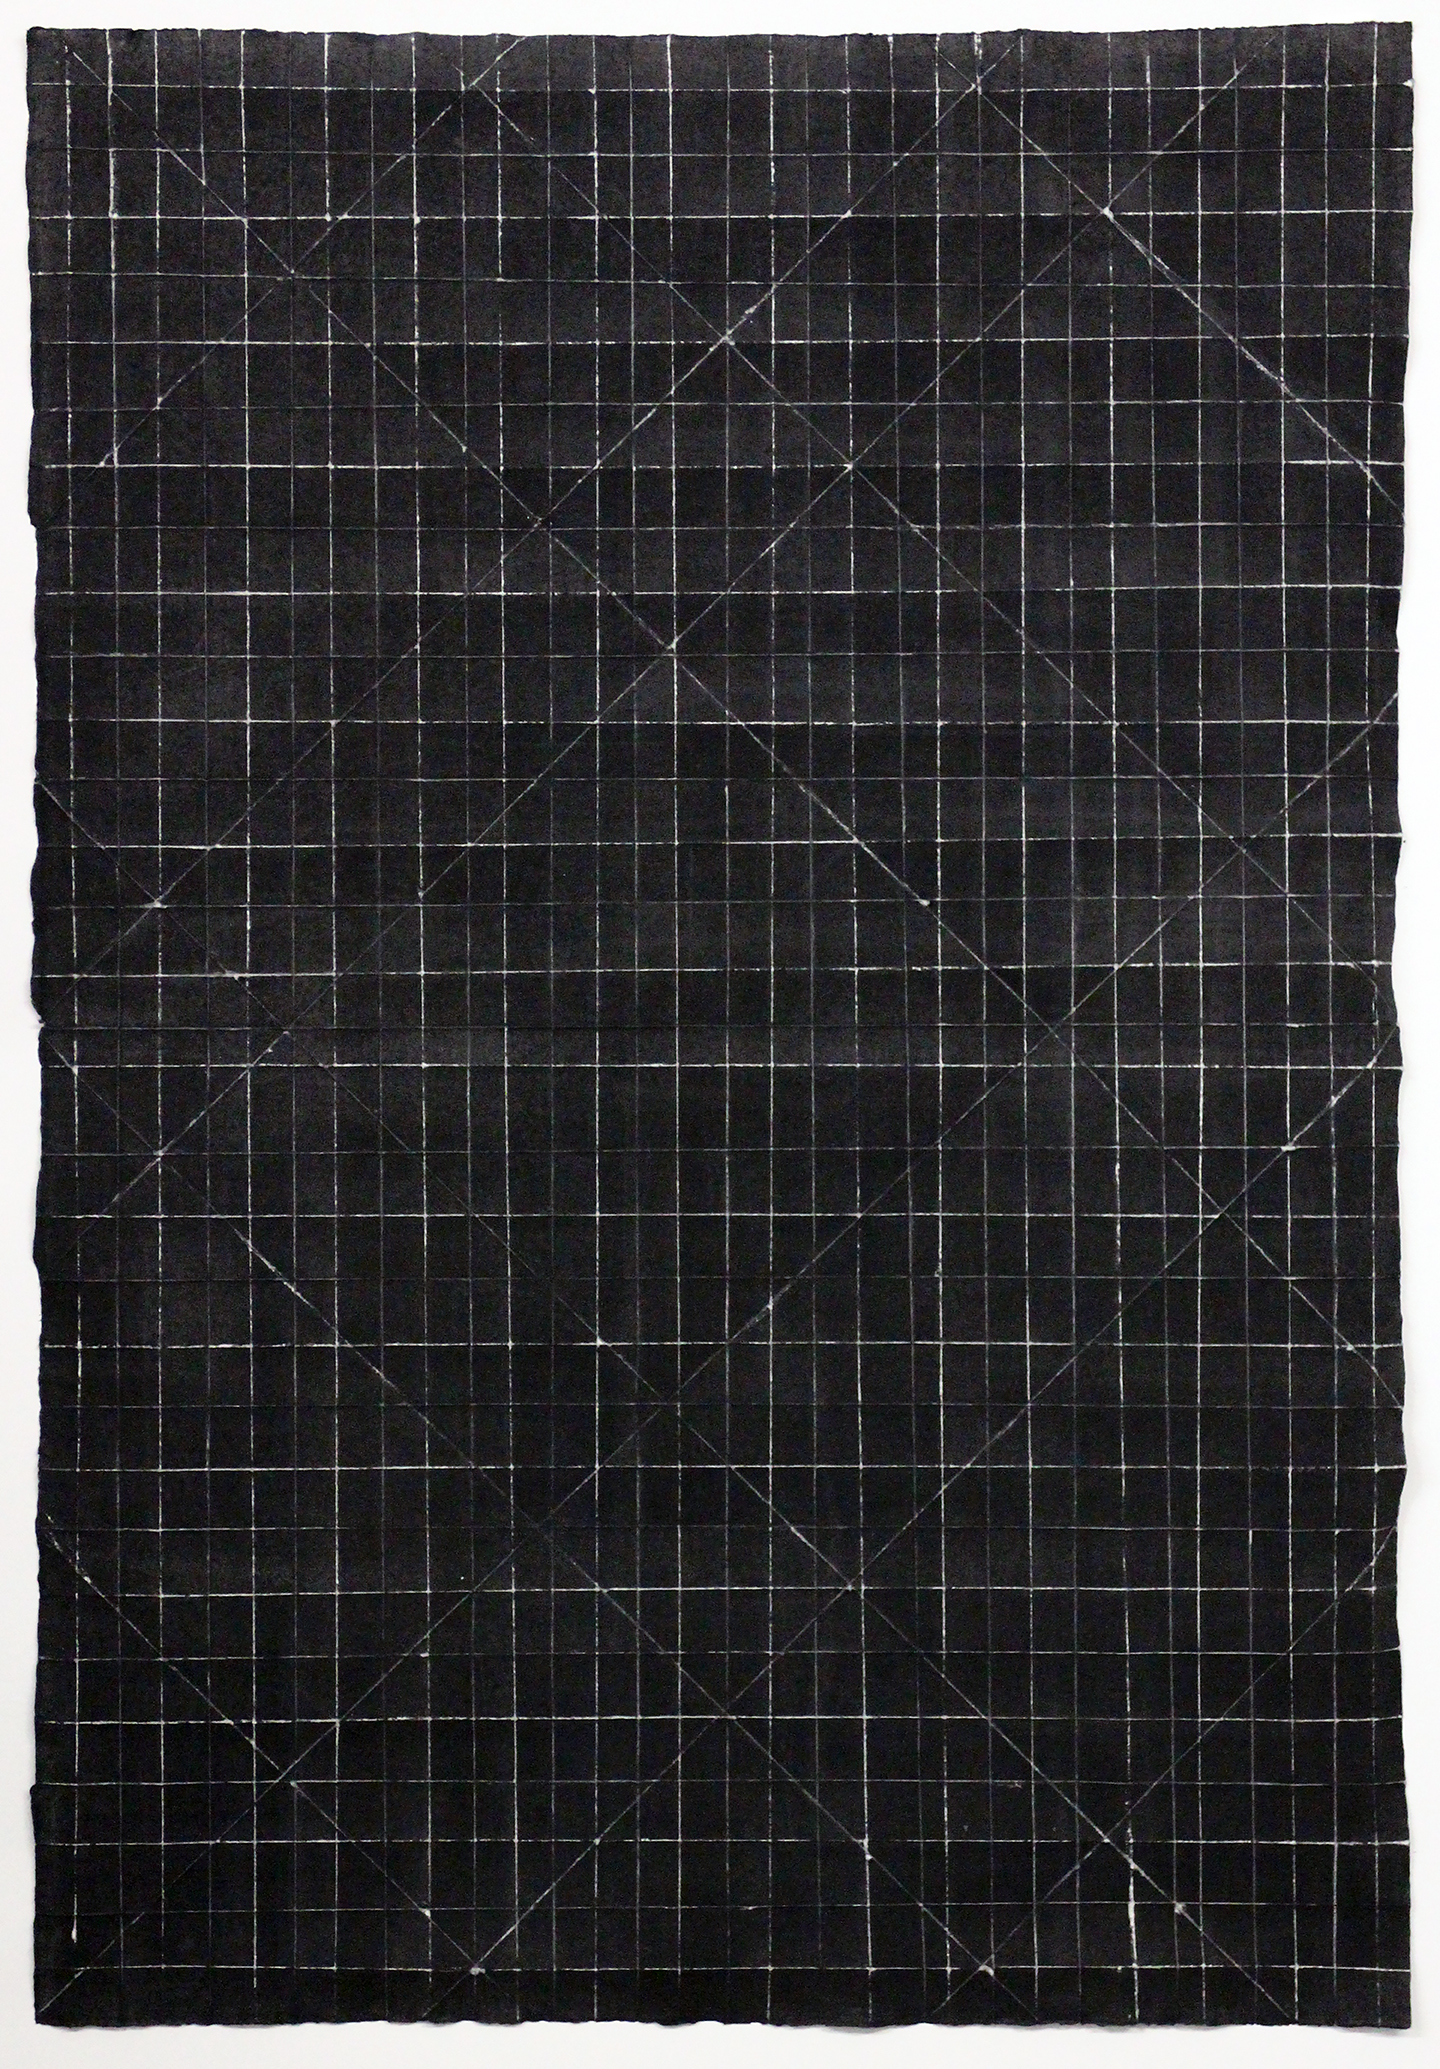 Diagonal Fold Drawing 1